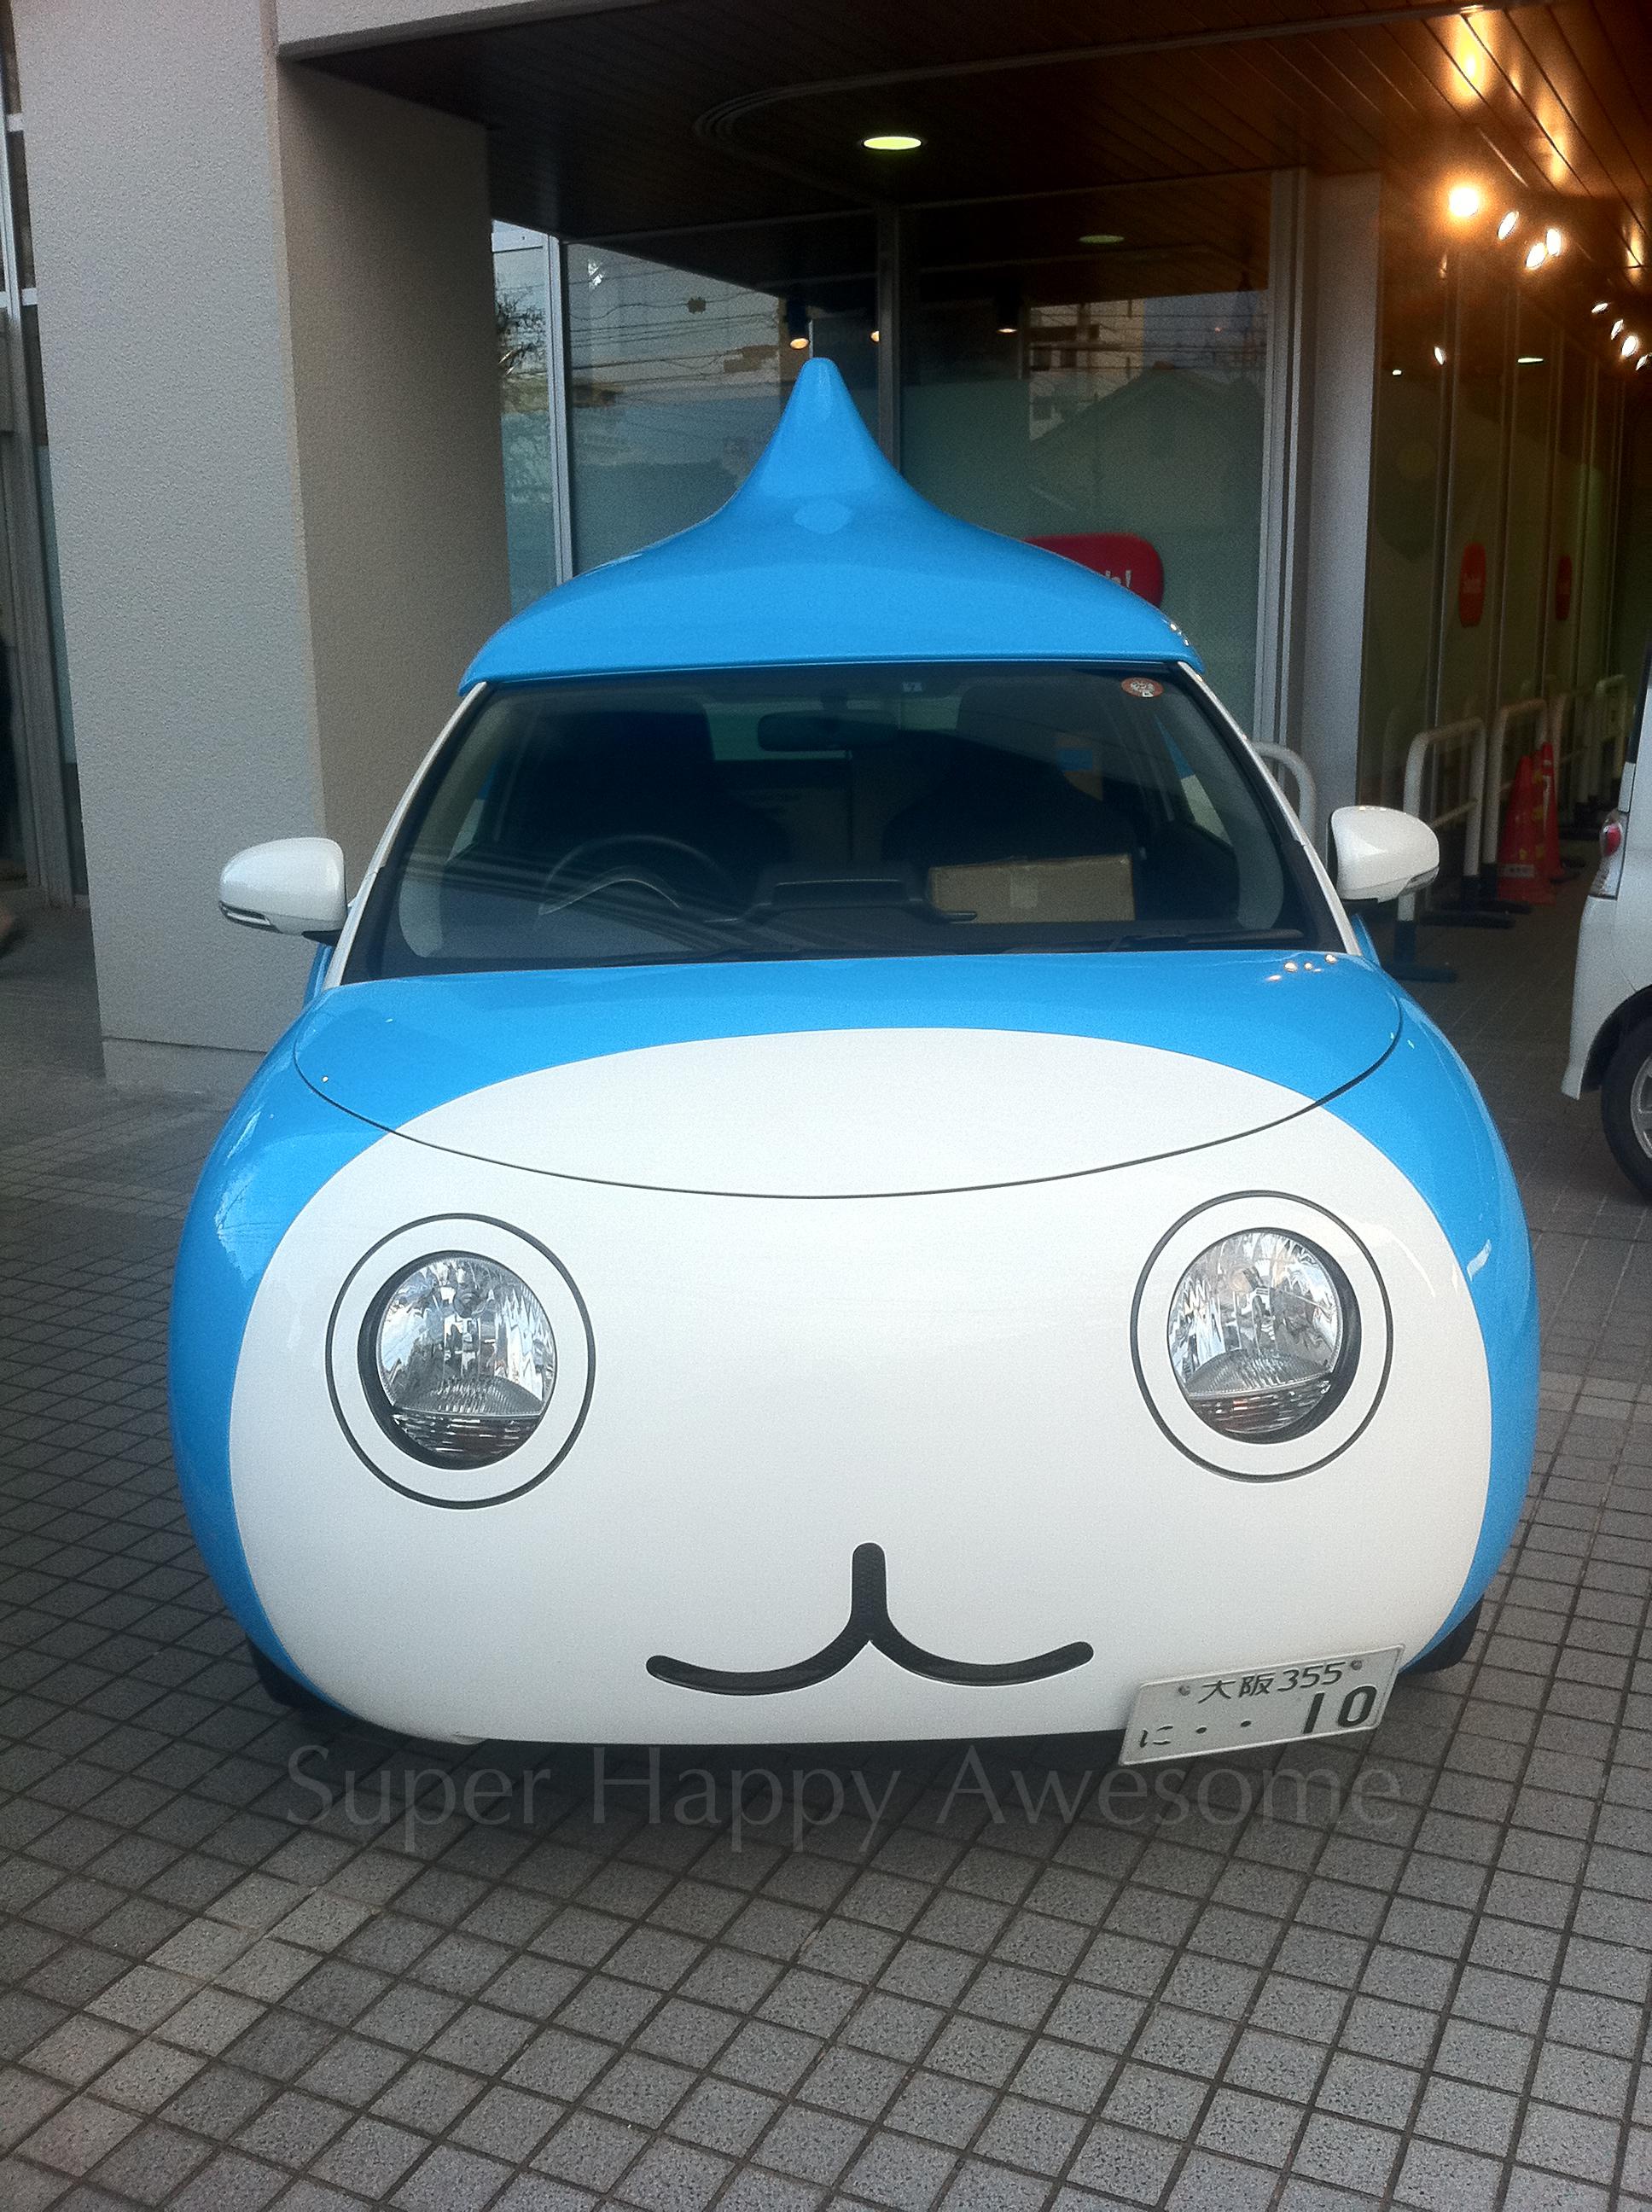 cutest planet superhappyawesome adorable japanese car3 copy